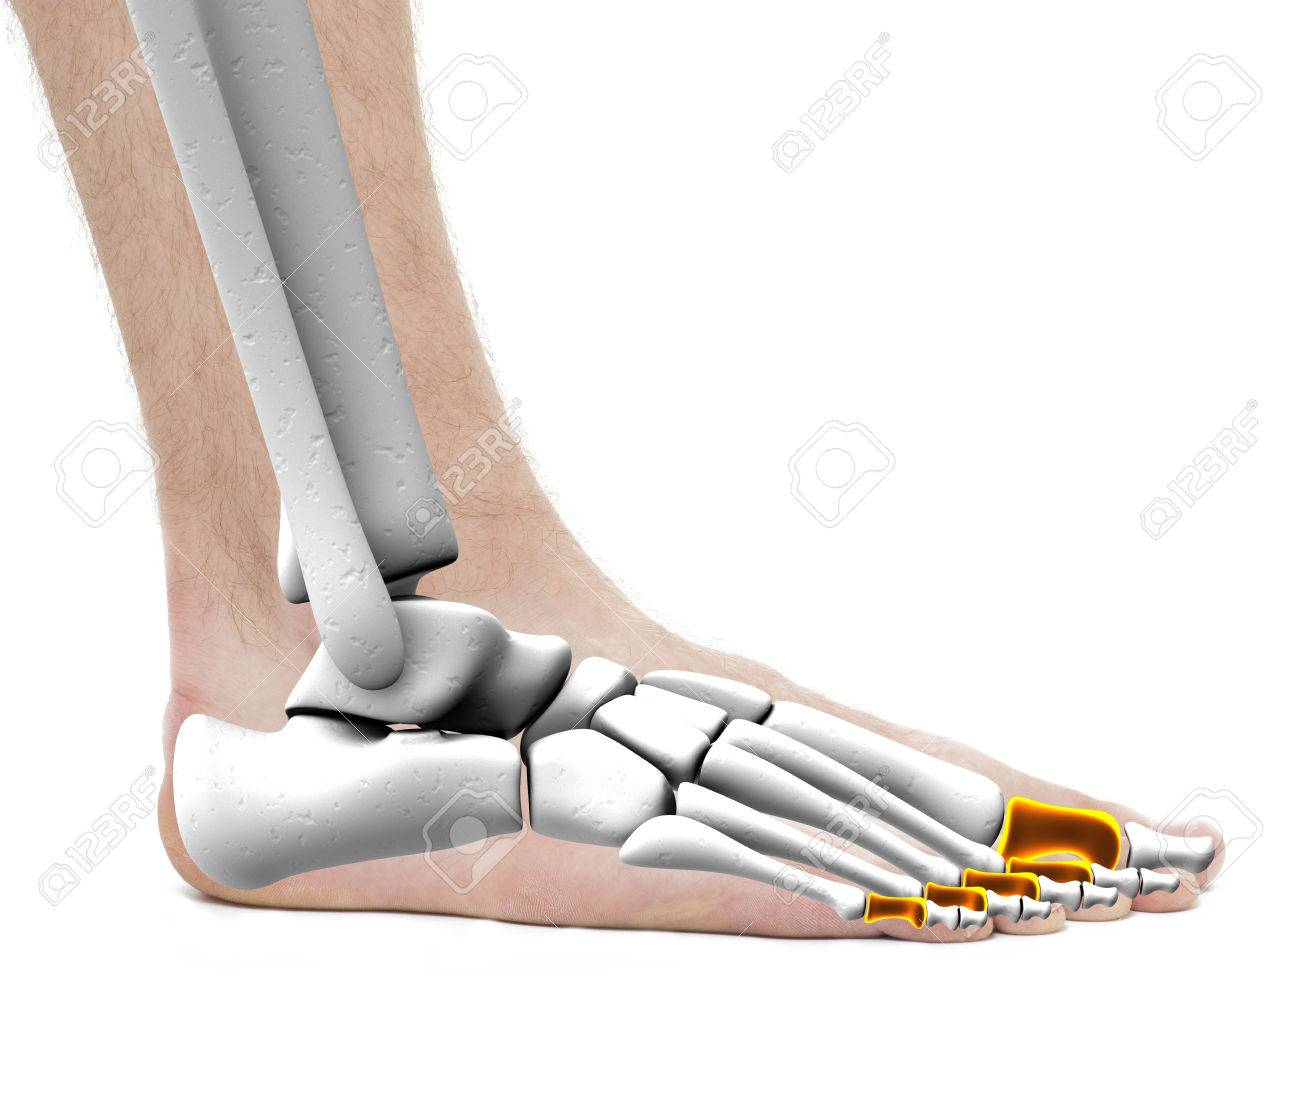 Proximal Bones - Anatomy Male - Studio Photo Isolated On White Stock ...